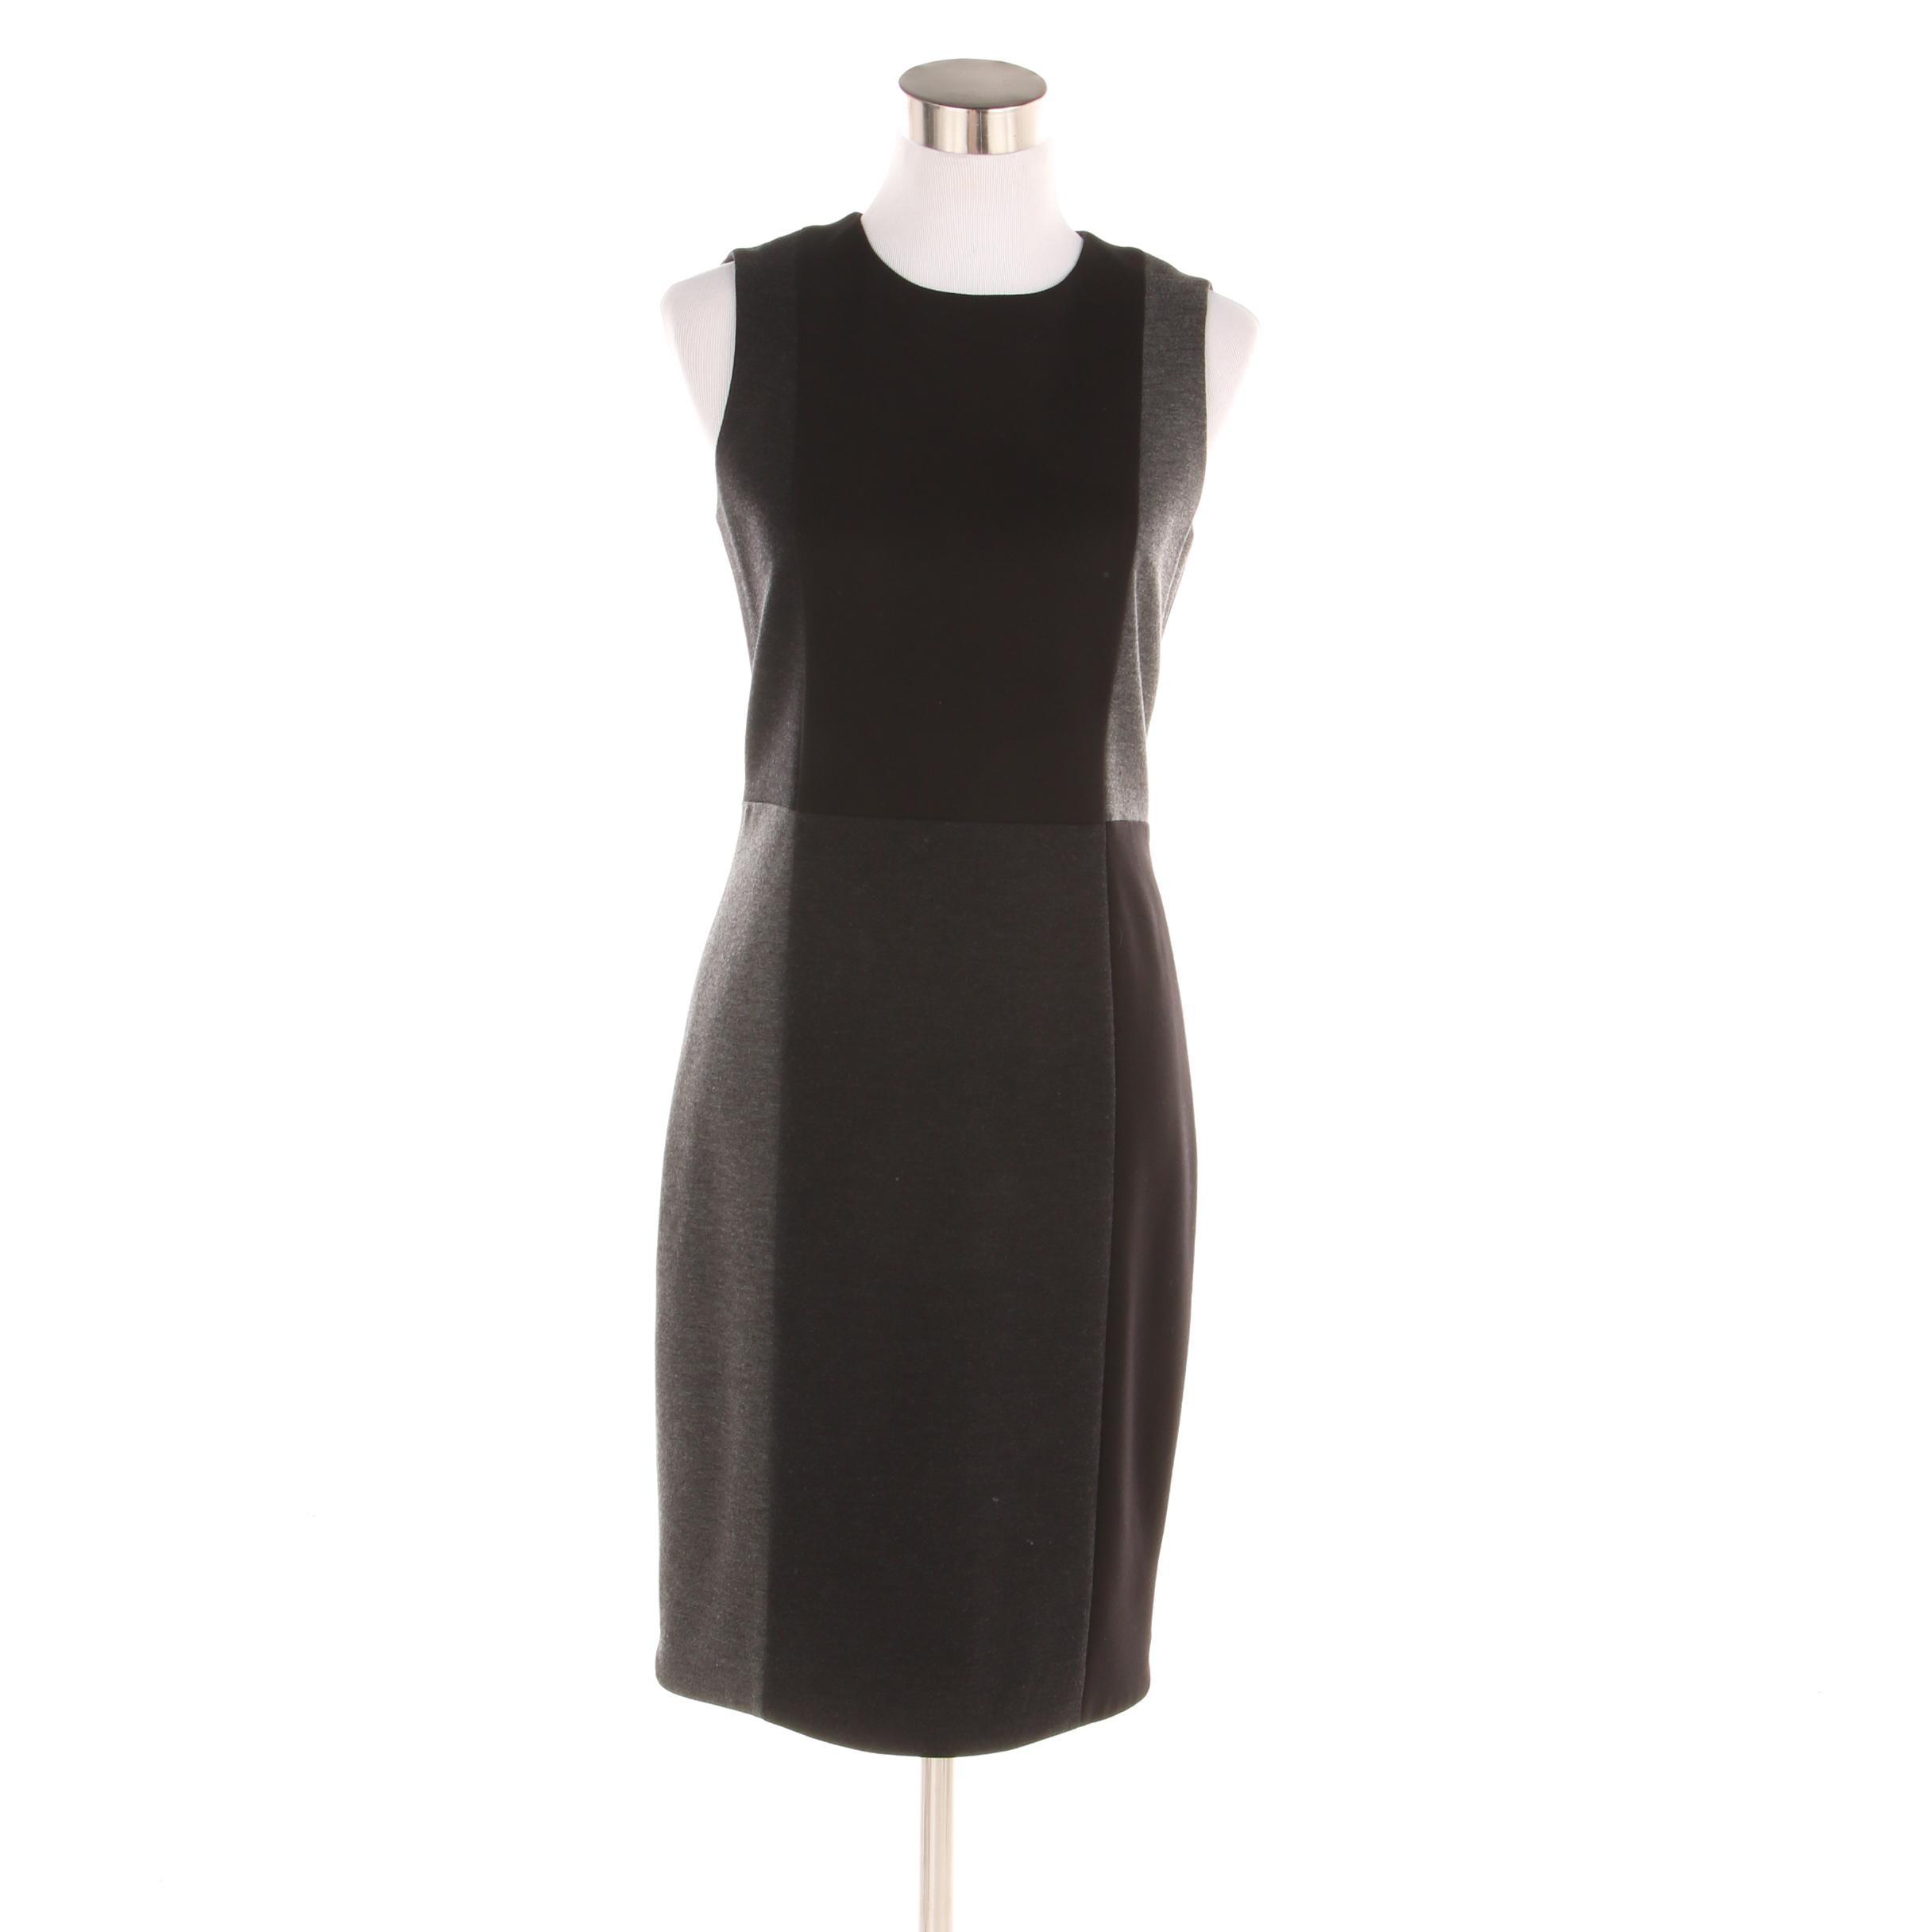 A-K-R-I-S Punto Sleeveless Black and Two-Tone Gray Colorblock Sheath Dress